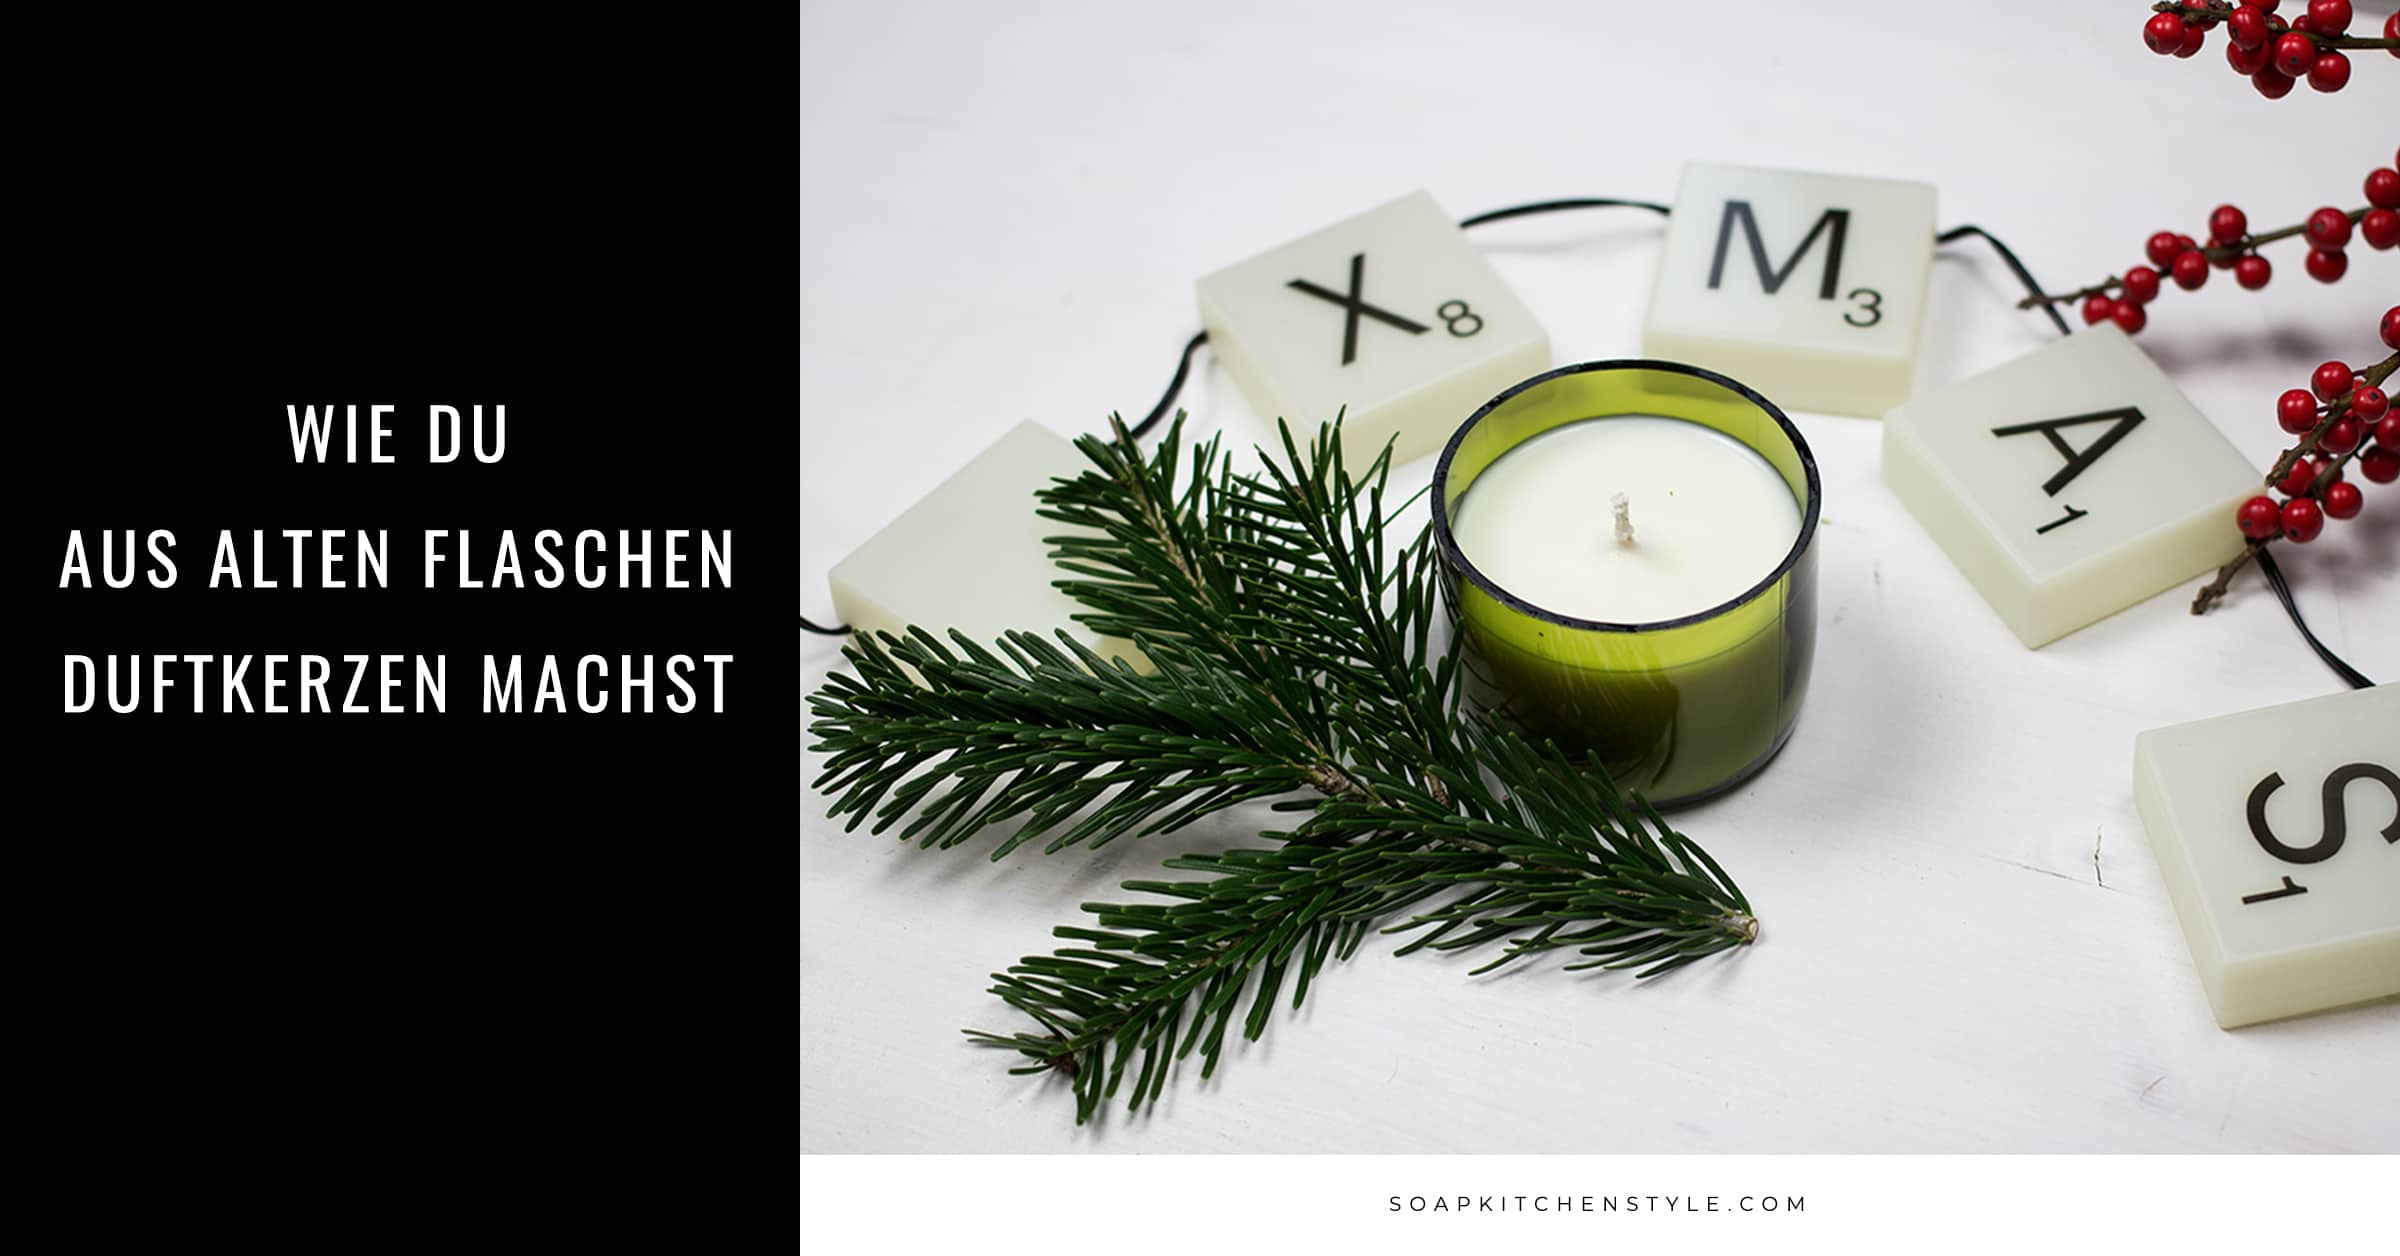 Duftkerzen-Flaschen-Upcycling |SOAP|KITCHEN|STYLE